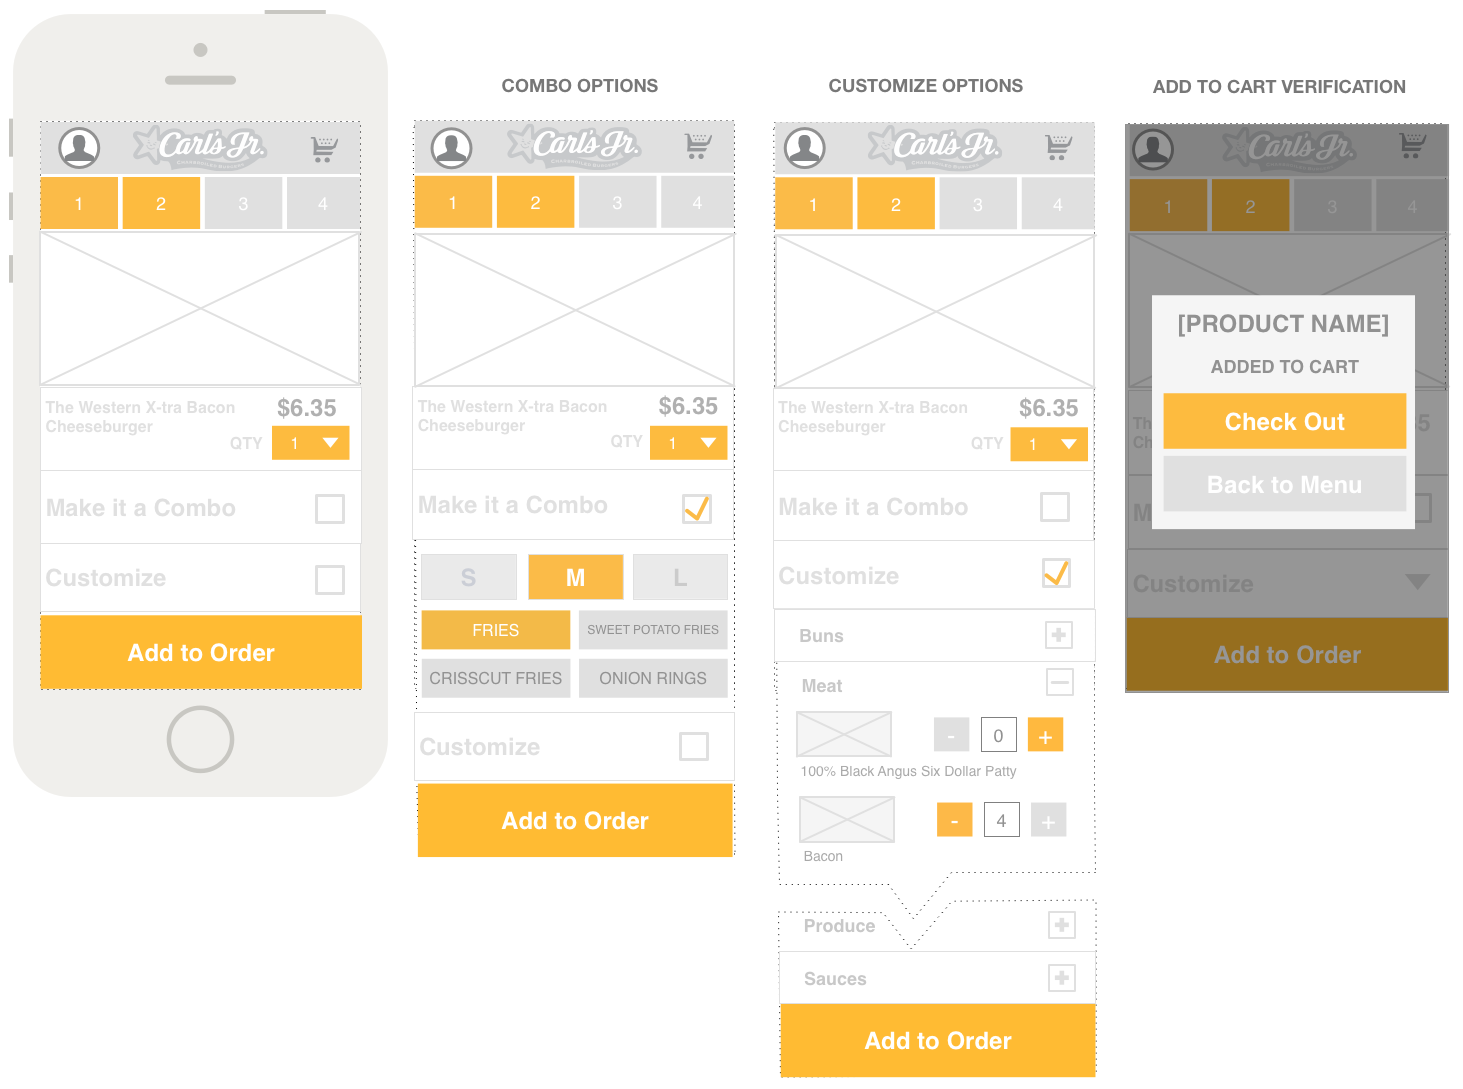 CKE_Mobile_Ordering_AL fix8.png